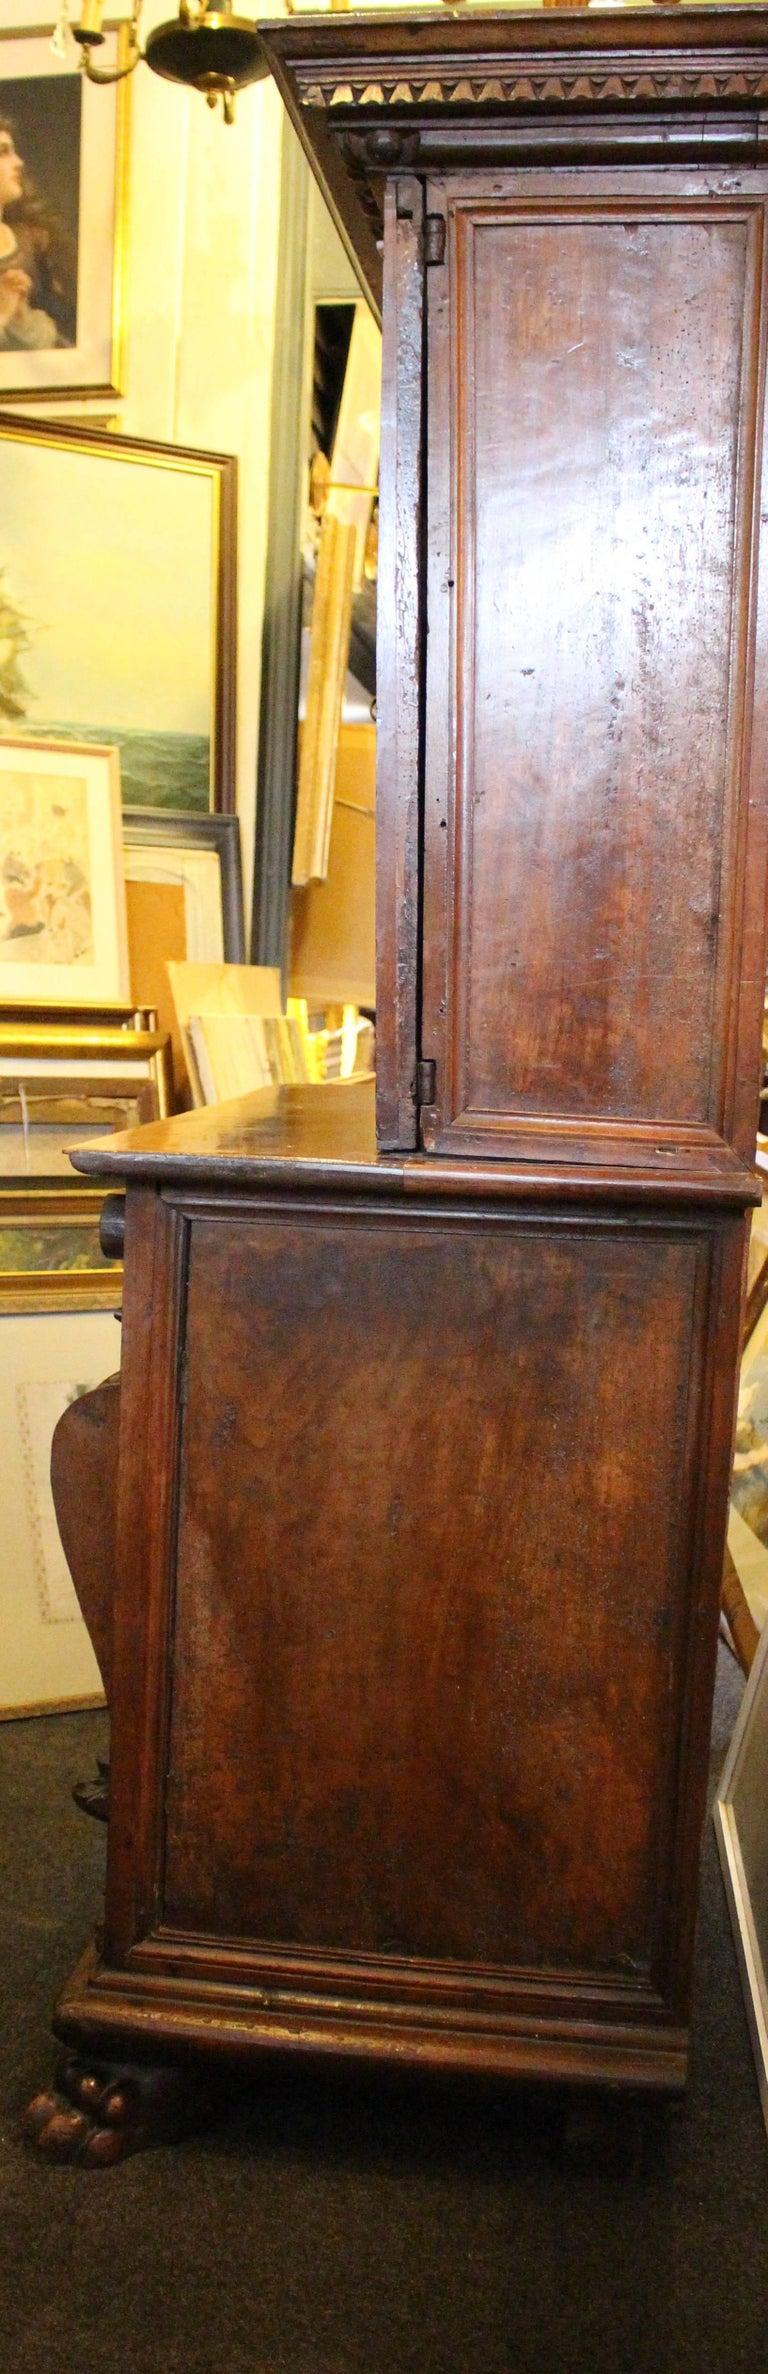 Italian Baroque Carved Walnut Cupboard, 17th Century For Sale 6